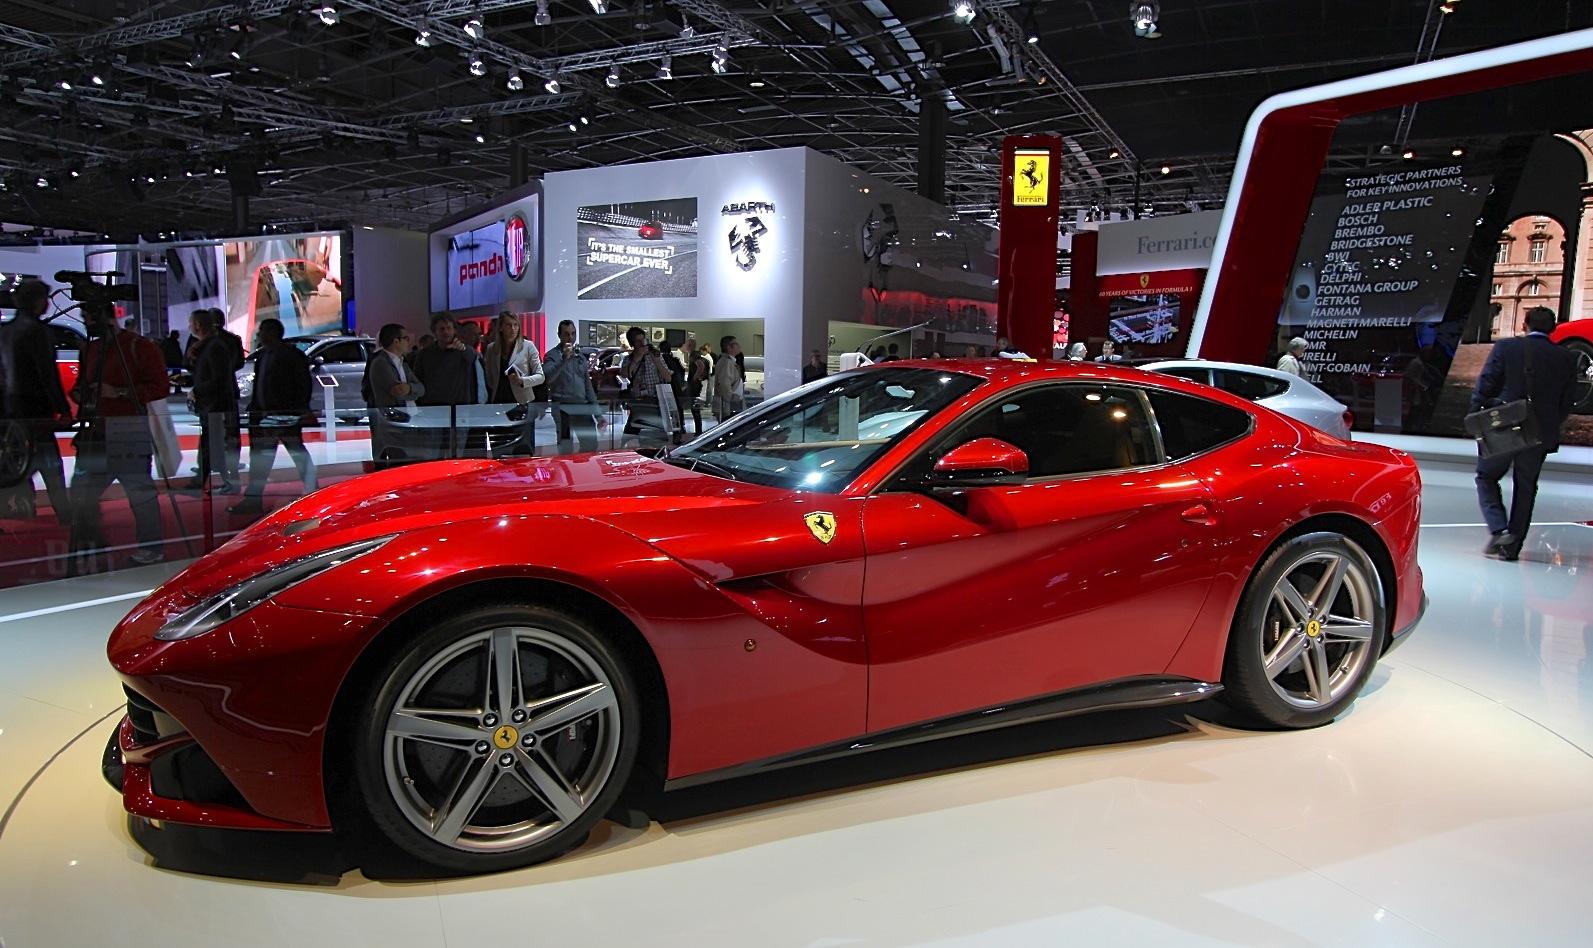 2013 Ferrari F12 Berlinetta Review, Ratings, Specs, Prices ...